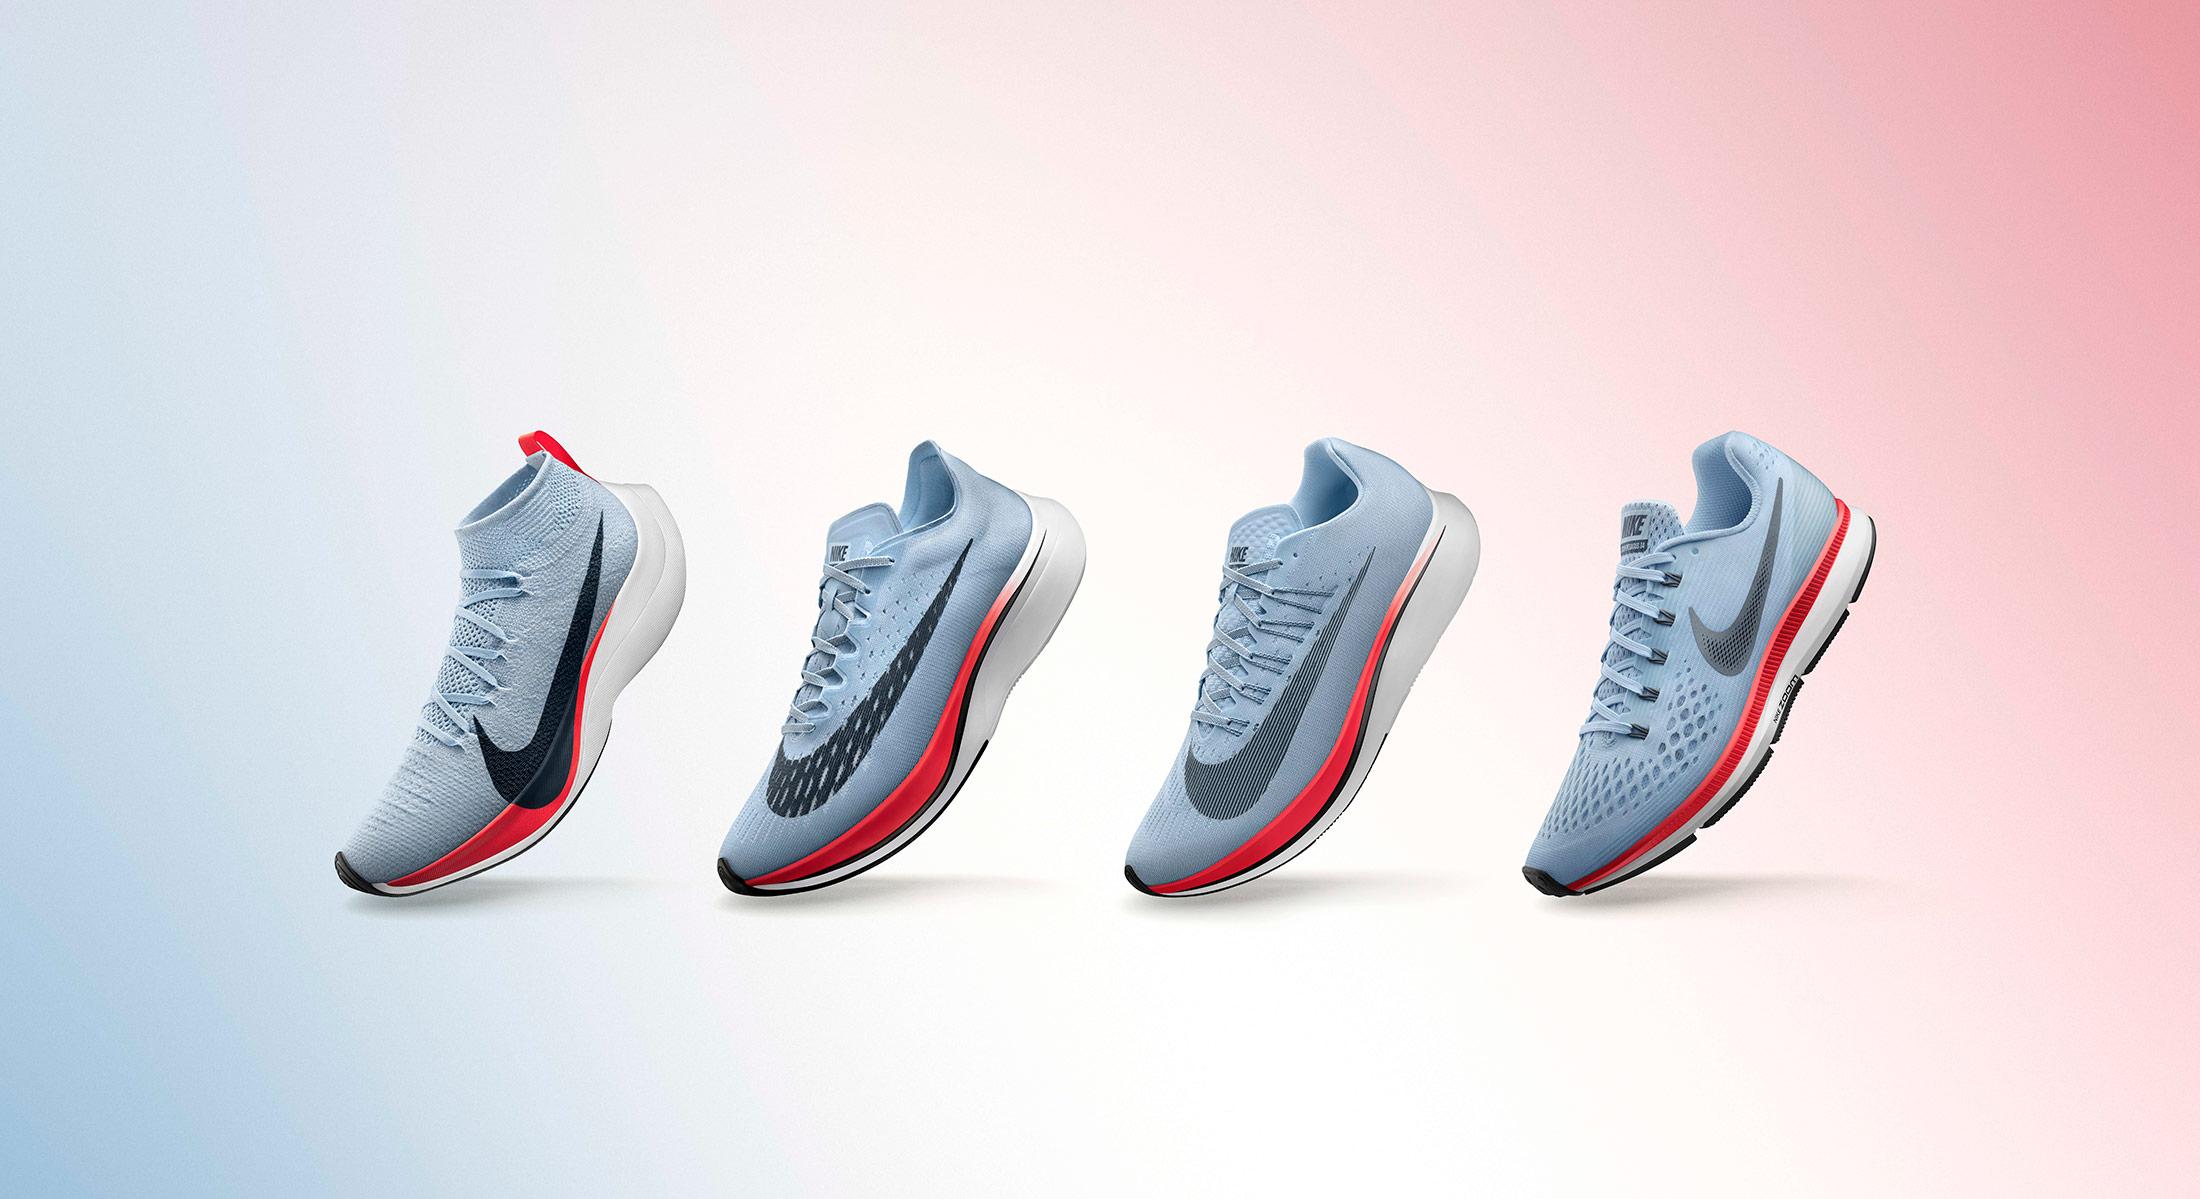 It's Nike Versus Adidas in Race to Break a Two Hour Marathon